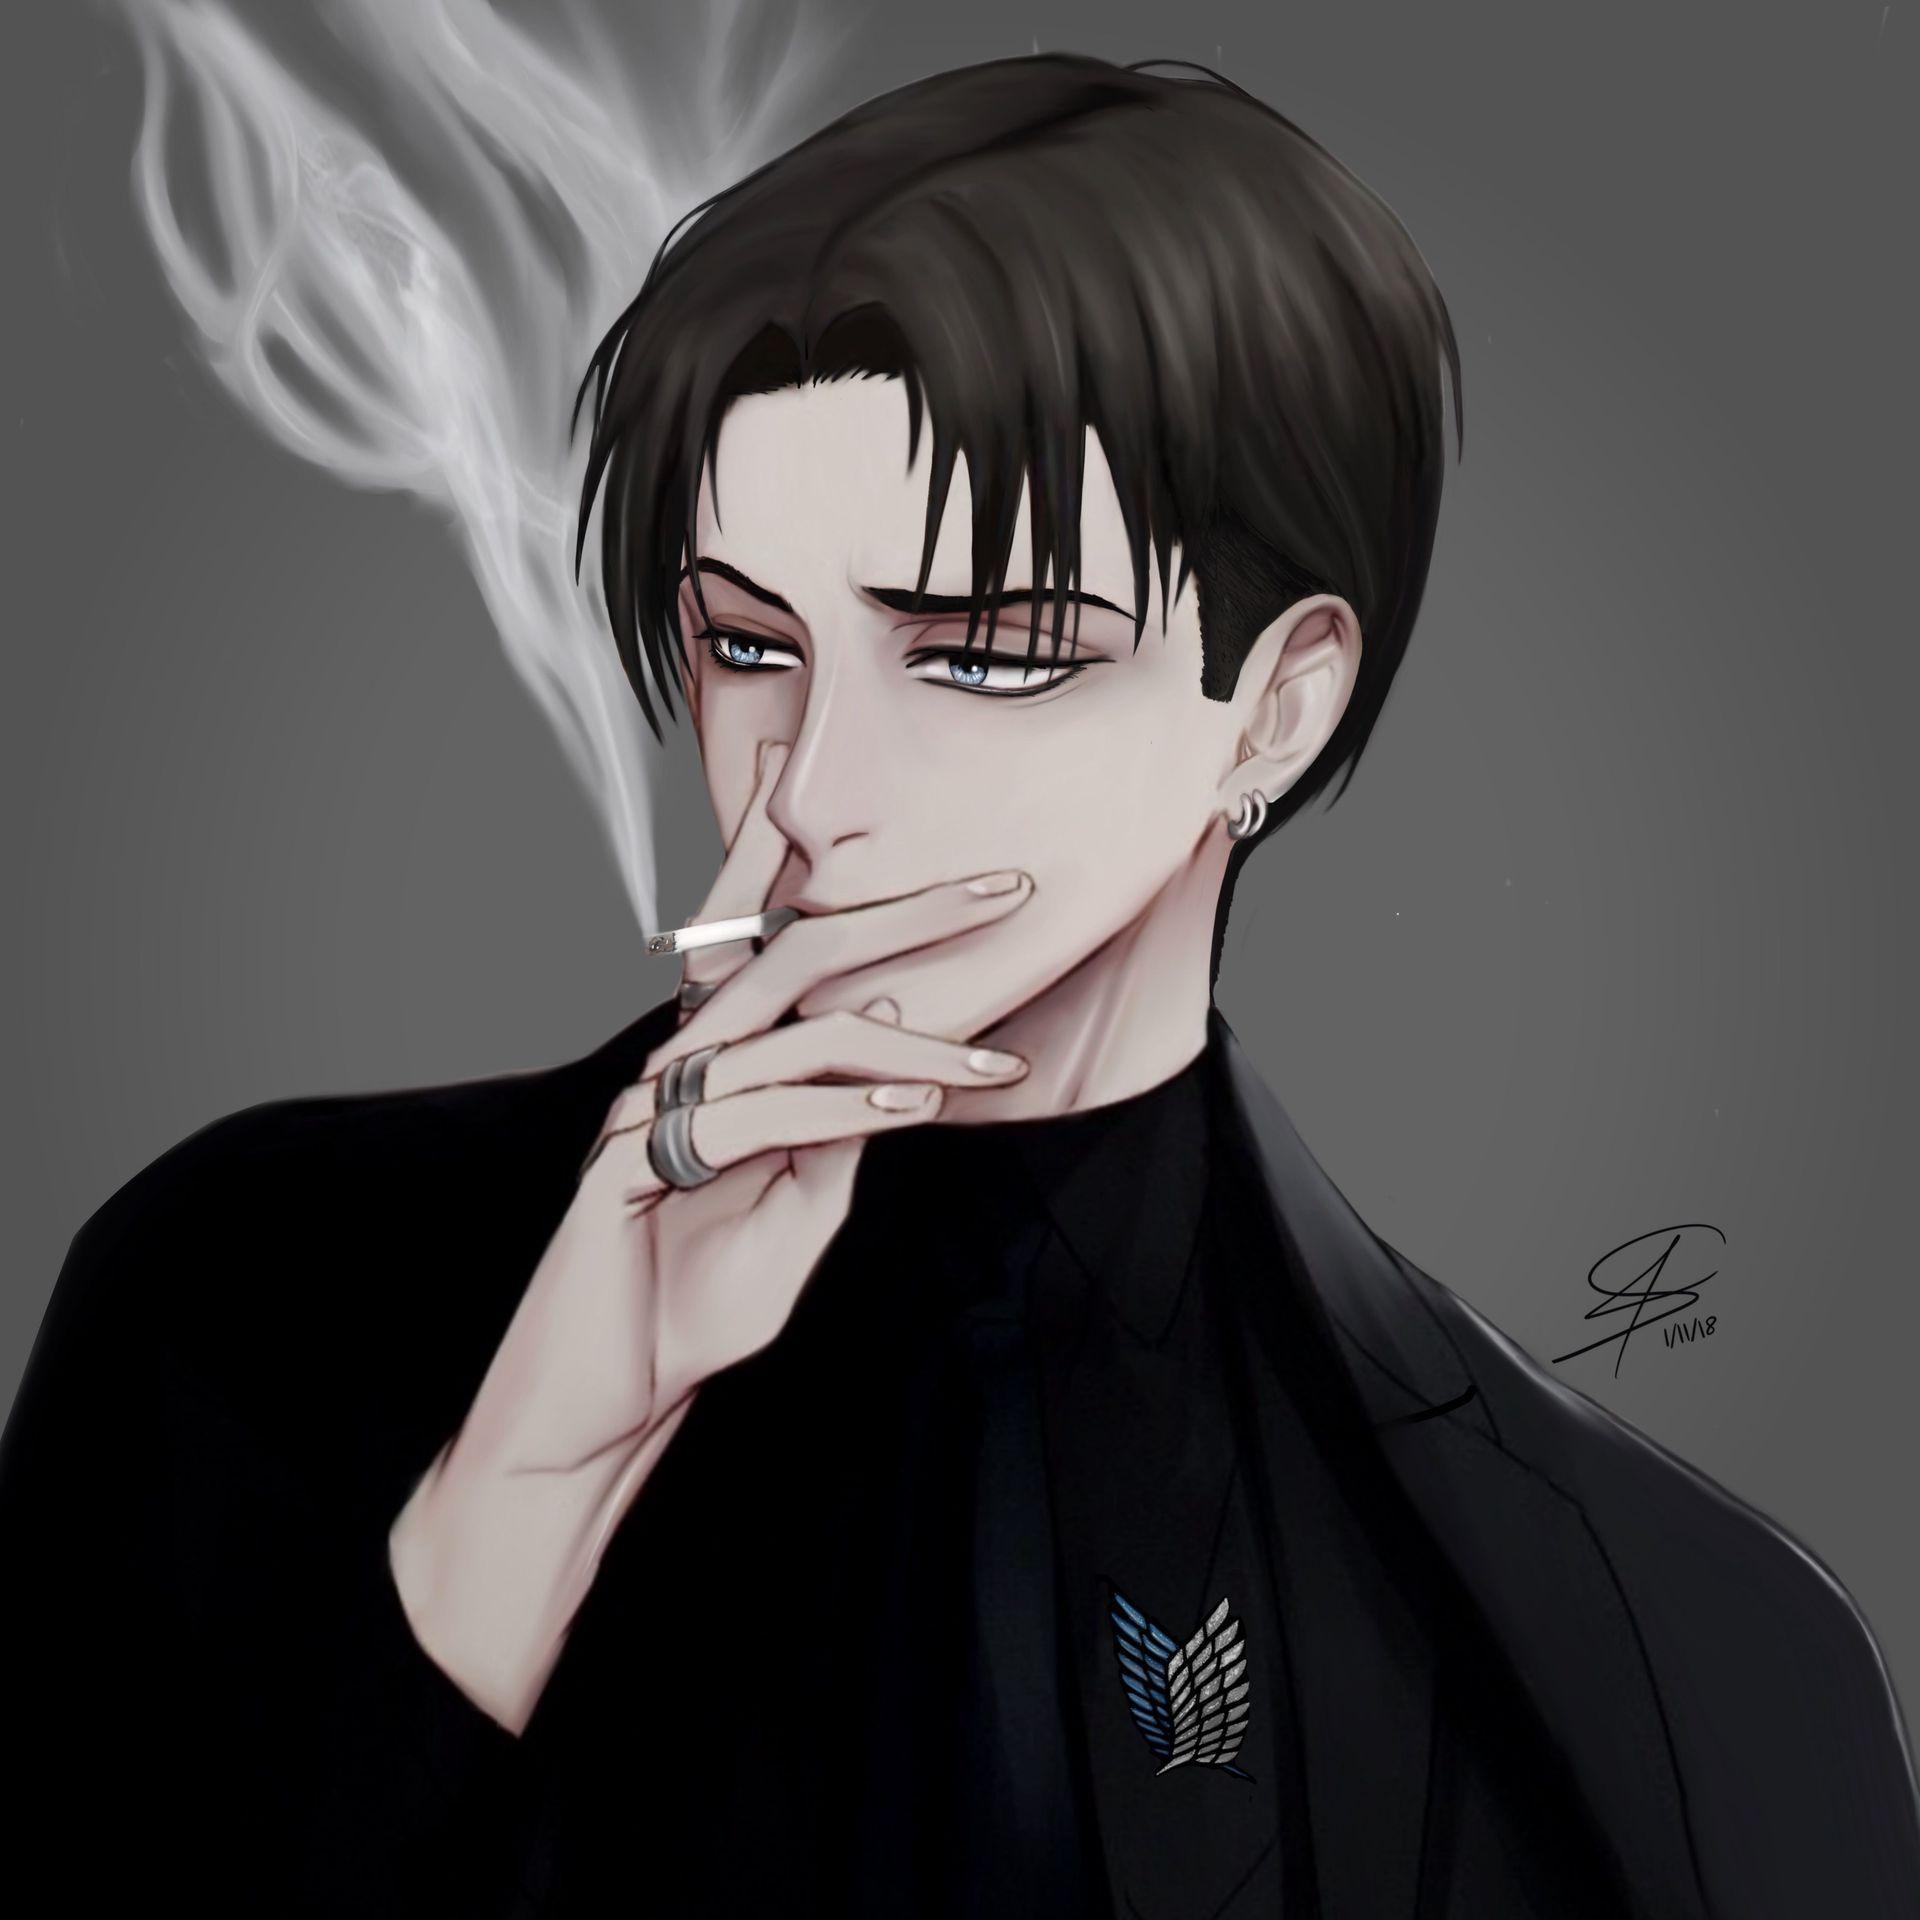 ʀᴇᴀᴄᴛɪᴏɴꜱ? • ᴏɴᴇ ᴘɪᴇᴄᴇ!ʀᴇᴀᴄᴛꜱ [Hiatus💫] - Chapter 13 • 第13章 (special)